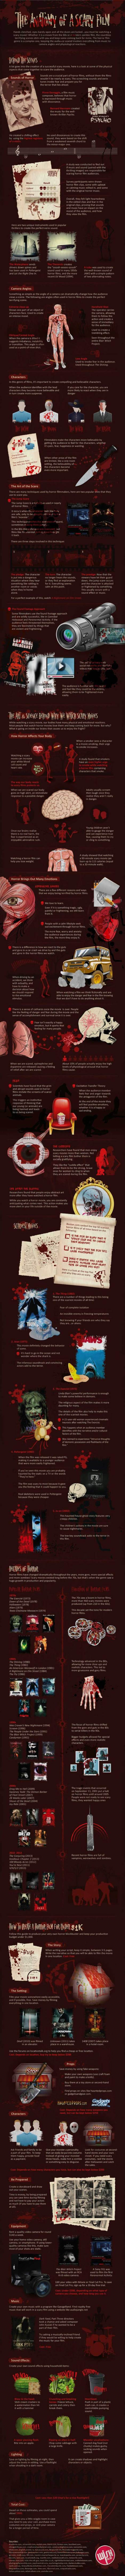 Filmes terror-infografia